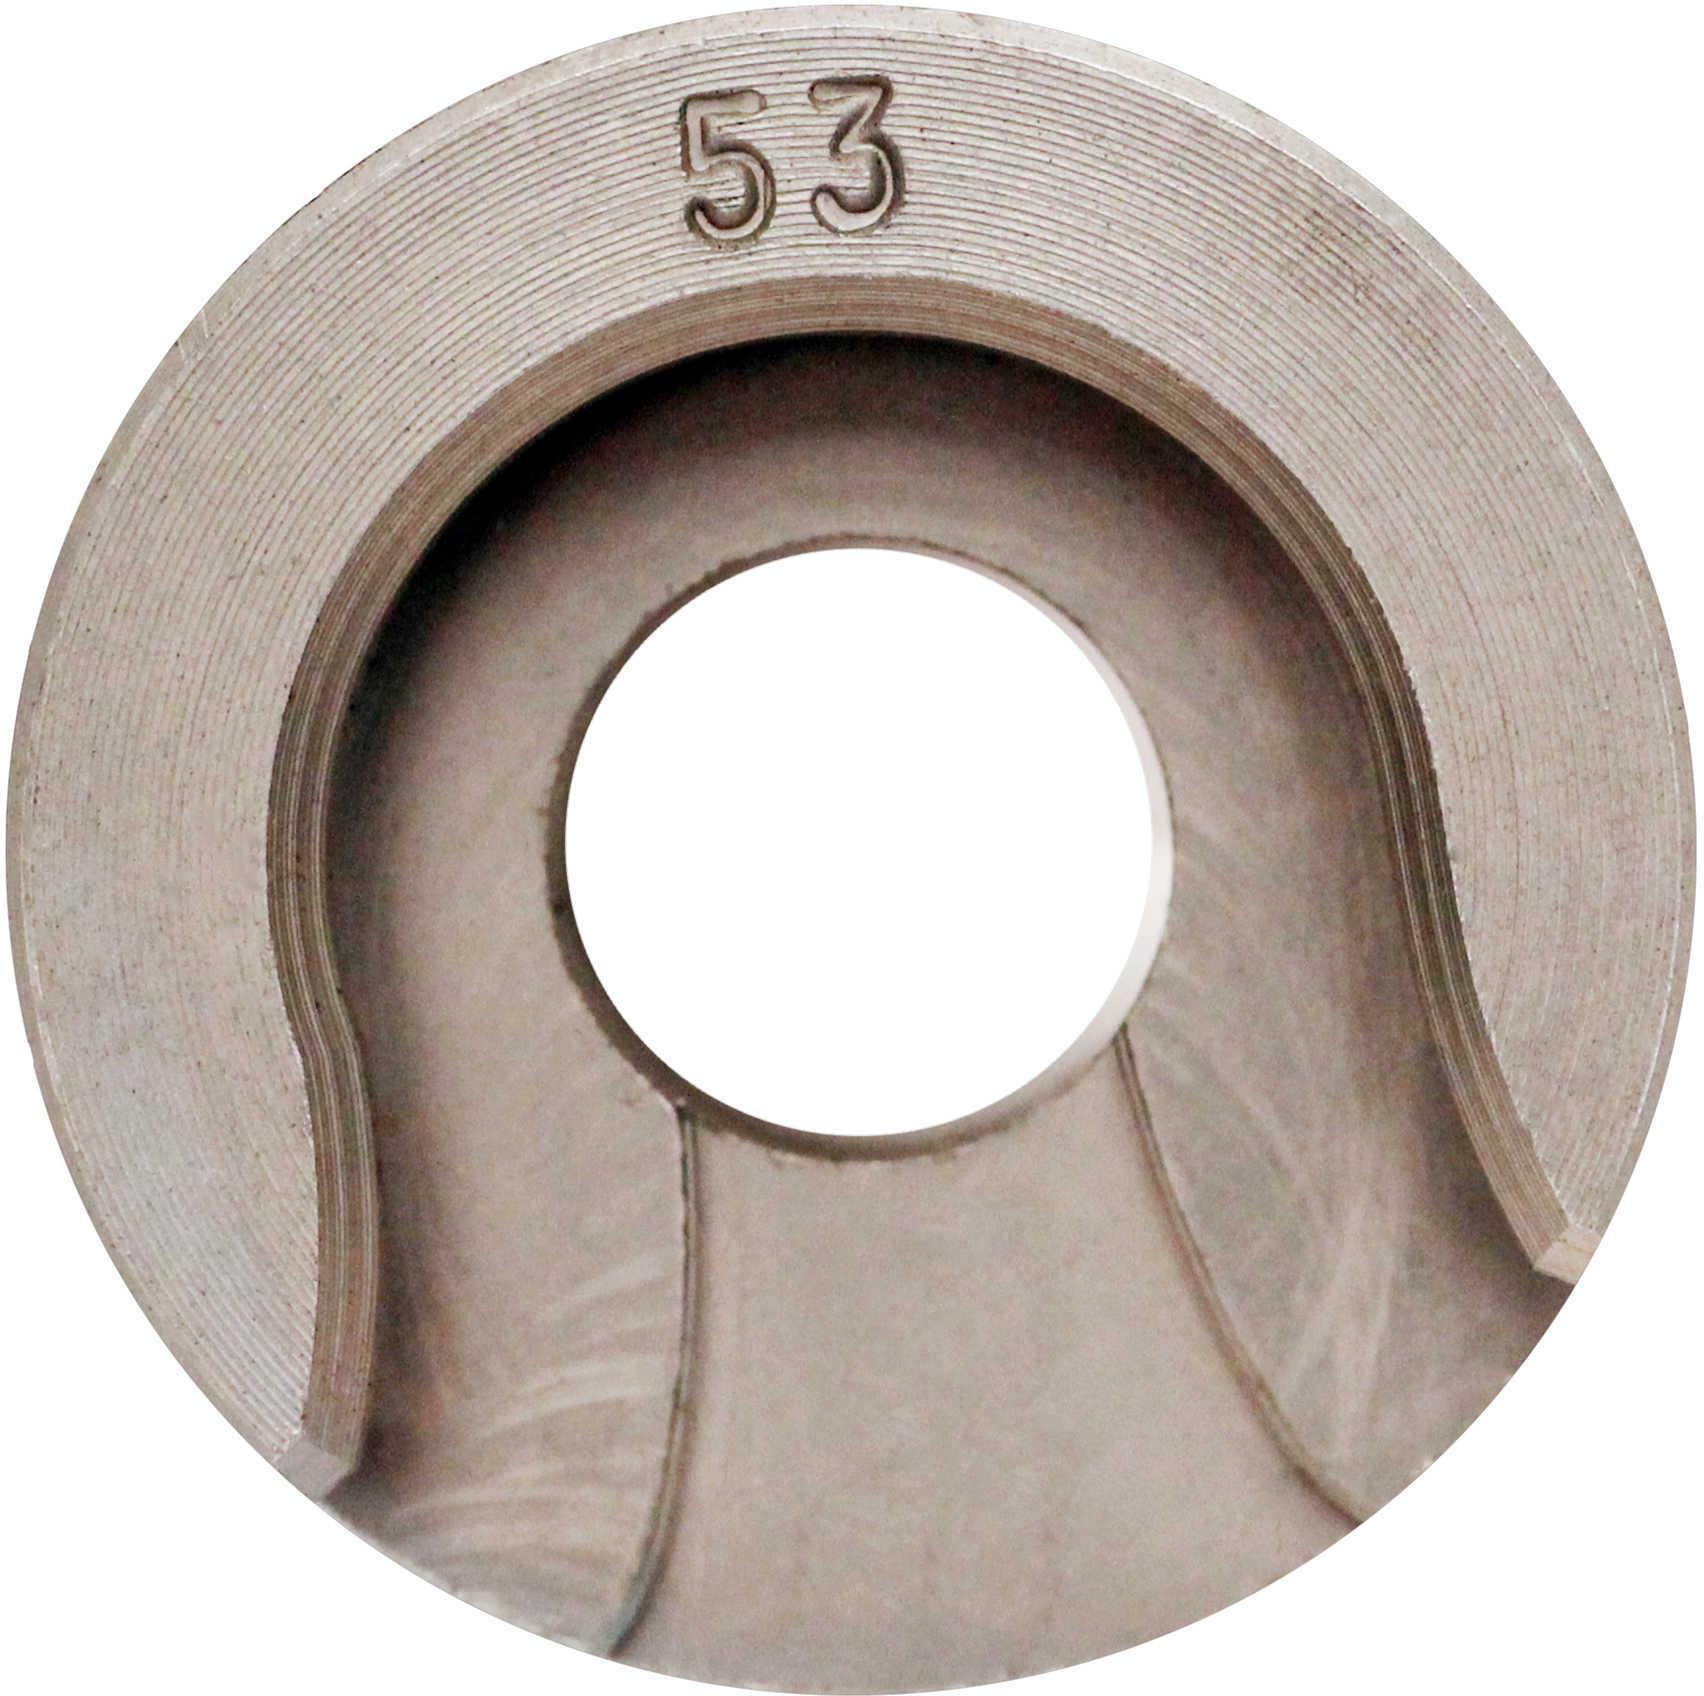 Hornady Shell Holder Size 35 Md: 390575